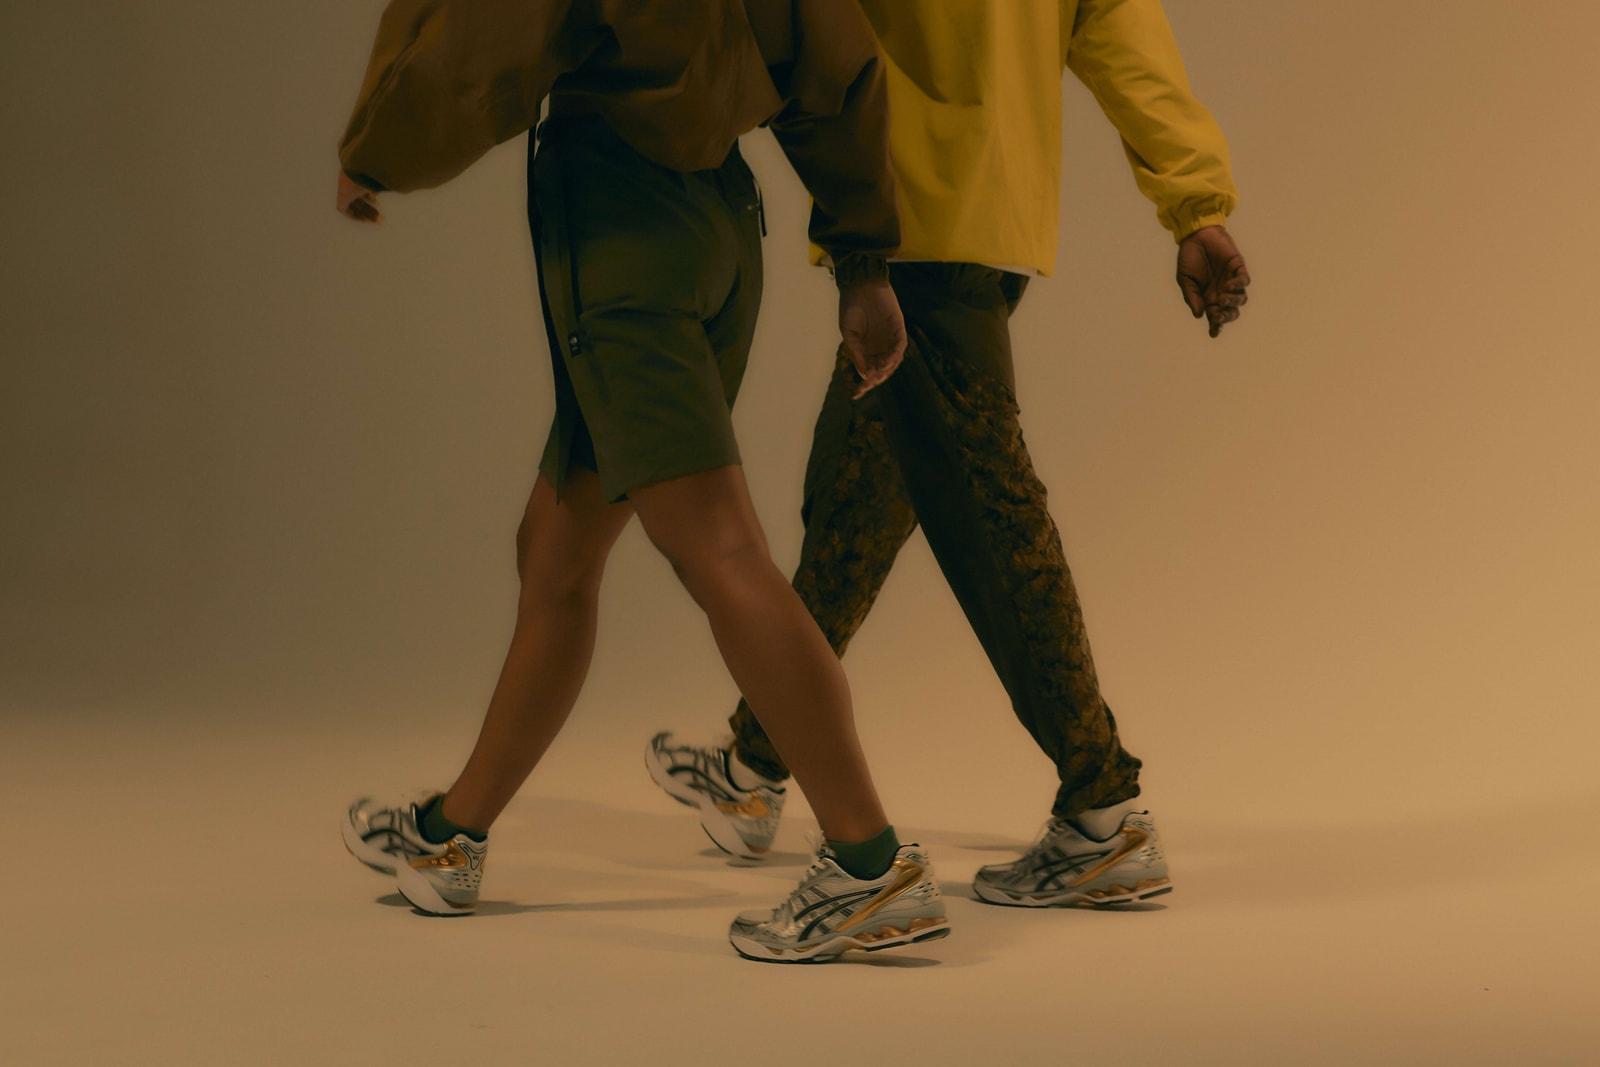 ASICS 在全新 GEL-KAYANO™ 14 中重现 2000 年代的跑鞋风格